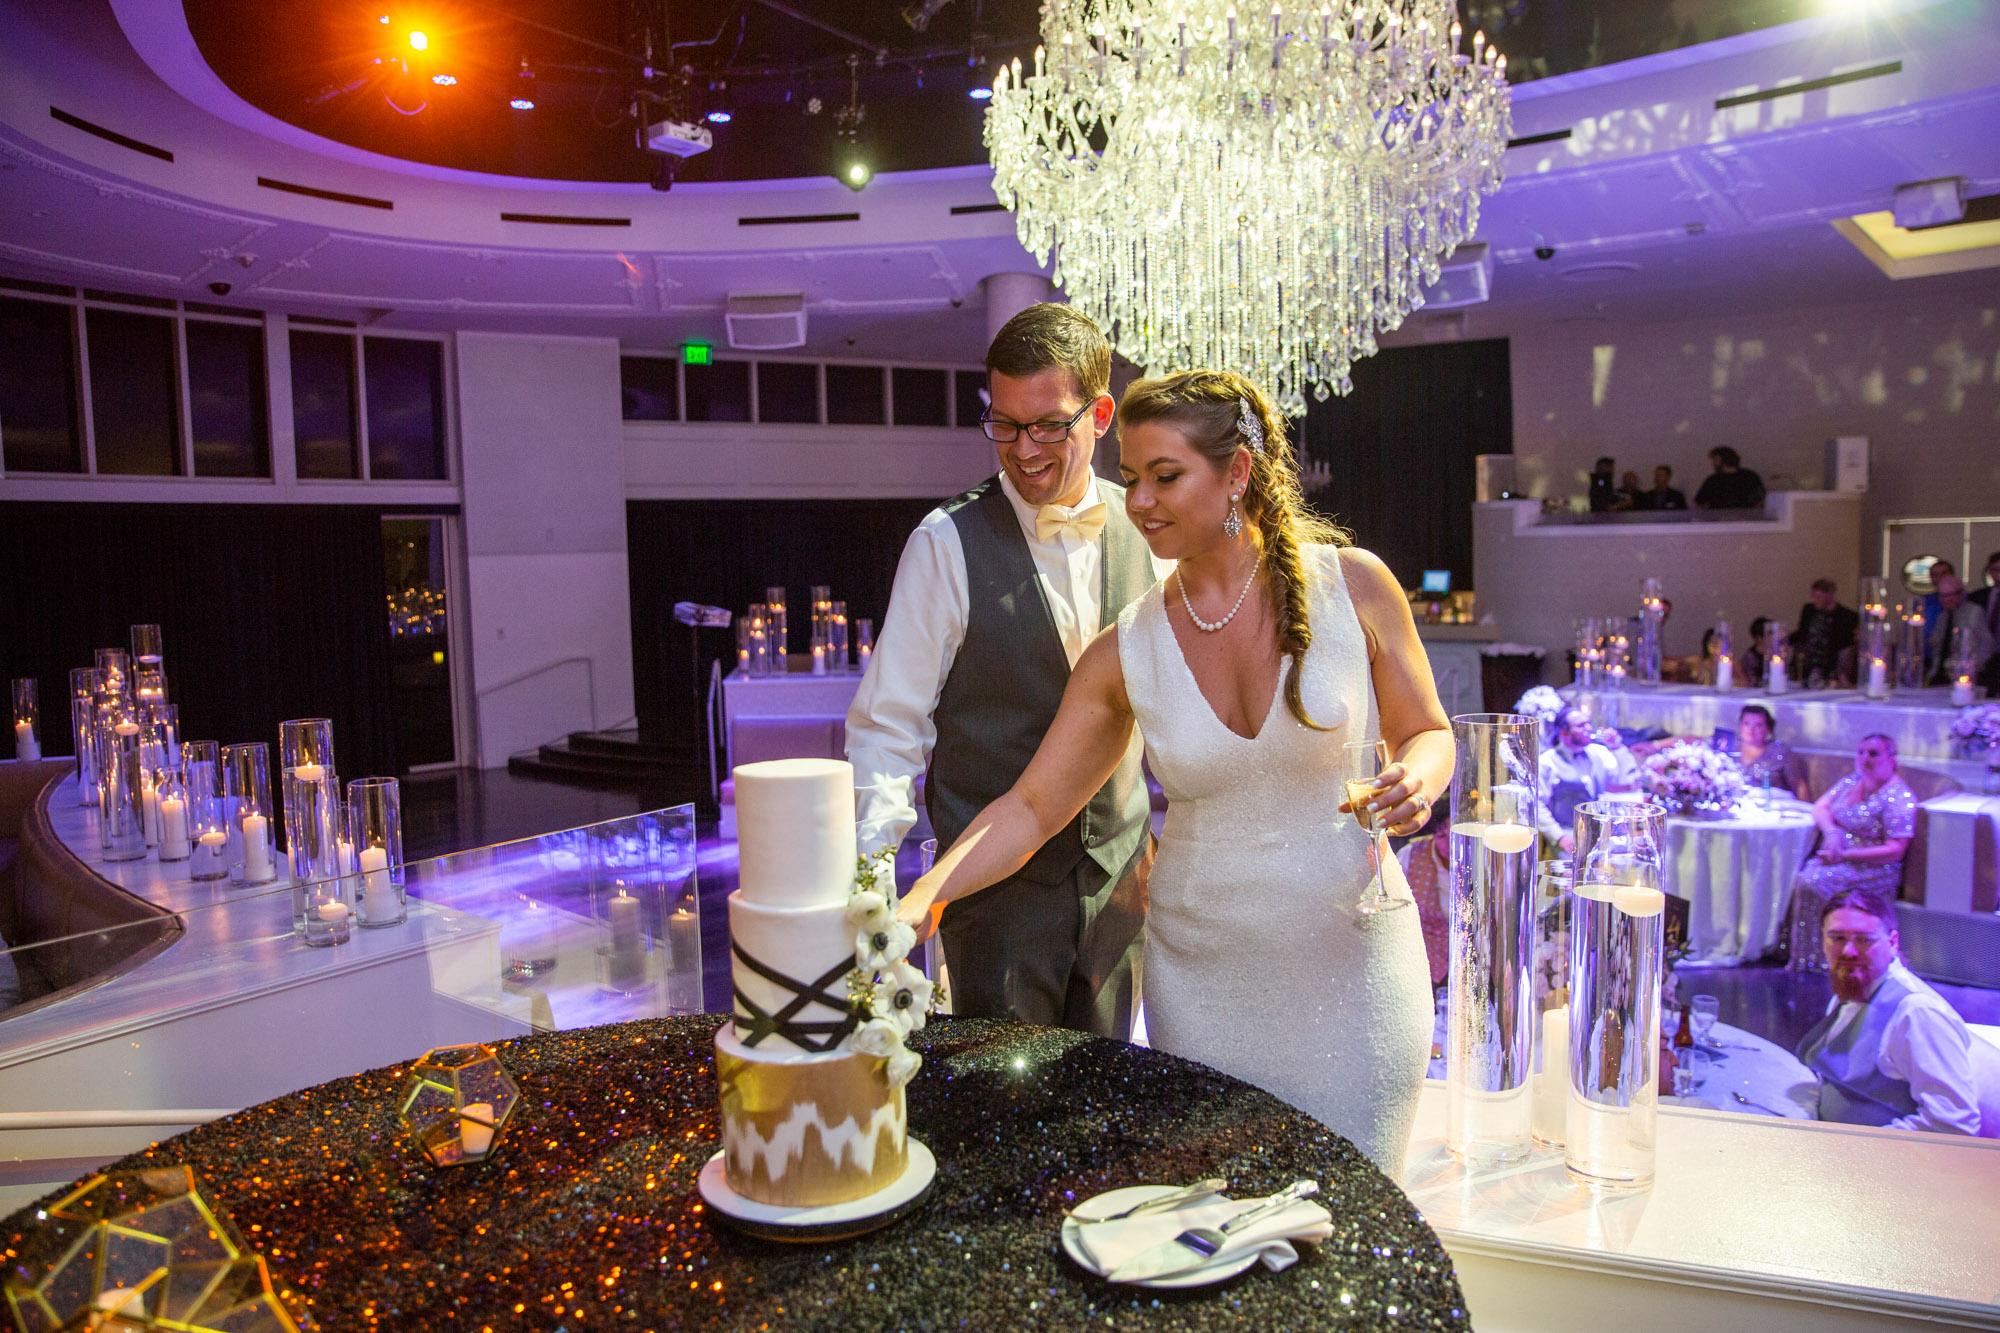 #lasvegasweddingplanners, #weddingplannerlasvegas, #weddingcoordinators, #lasvegasweddingcoordinators, #havanaroomlasvegaswedding #tropicanalasvegas #troplv #tropicanaweddinglasvegas #tropicanawedding #weddinglasvegas #luxuryweddingplanner #celebrityweddingplannerlasvegas #lasvegasstripwedding #cakecutting #cake #brideandgroom